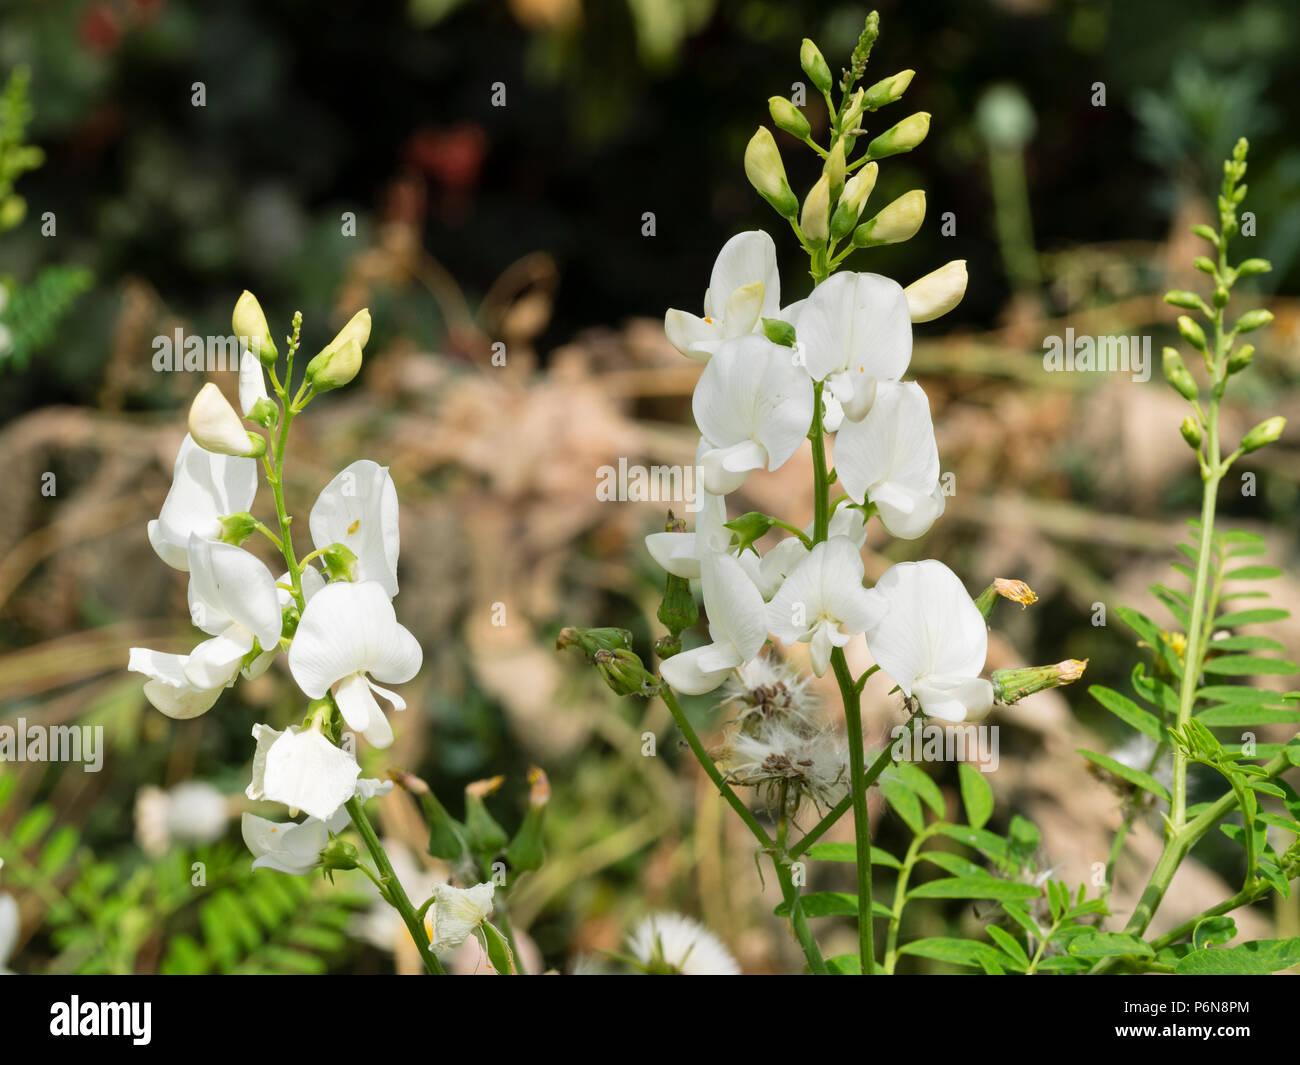 White pea flowers of the tender Australian perennial Darling pea, Swainsona galegifolia 'Alba' - Stock Image